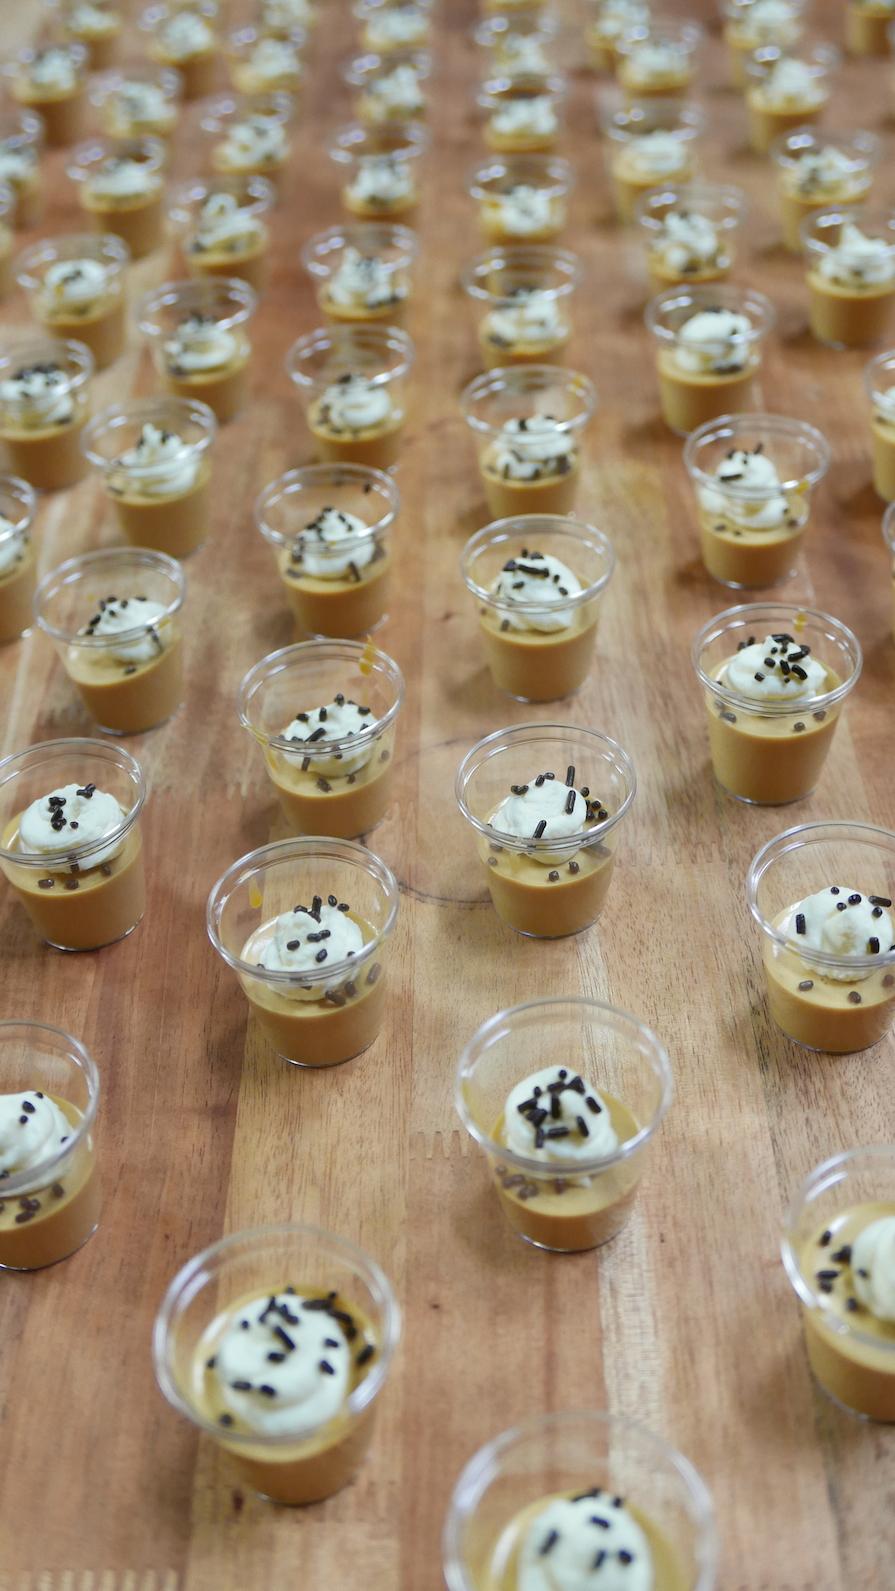 receita-dani-noce-pannacotta-doce-de-leite-evento-tastemade-apple-tv-2015-4o